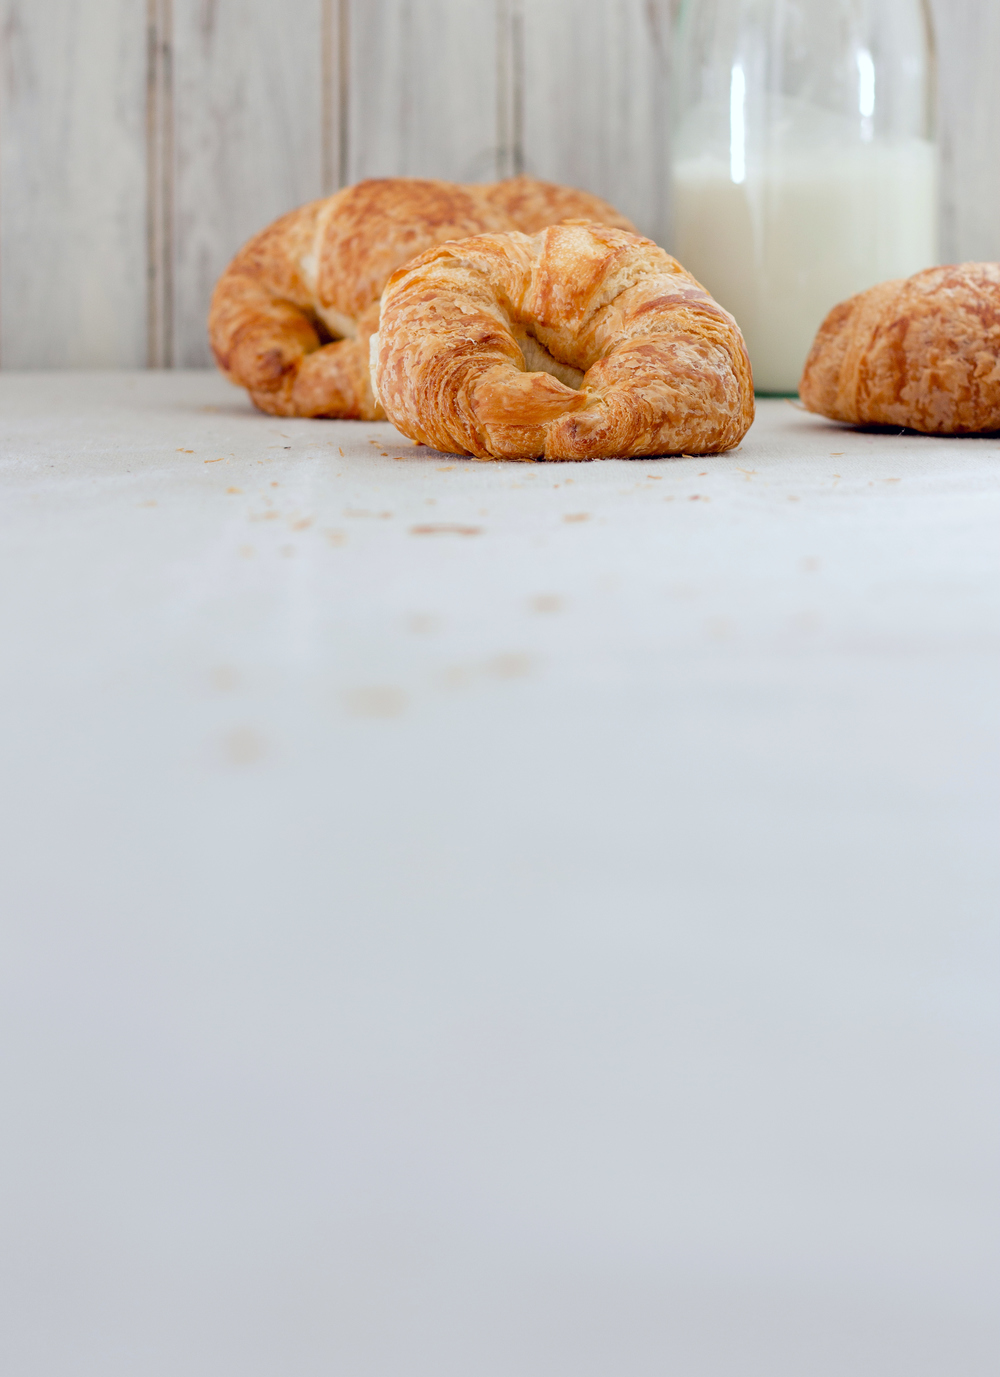 milk and croissants1.1.jpg